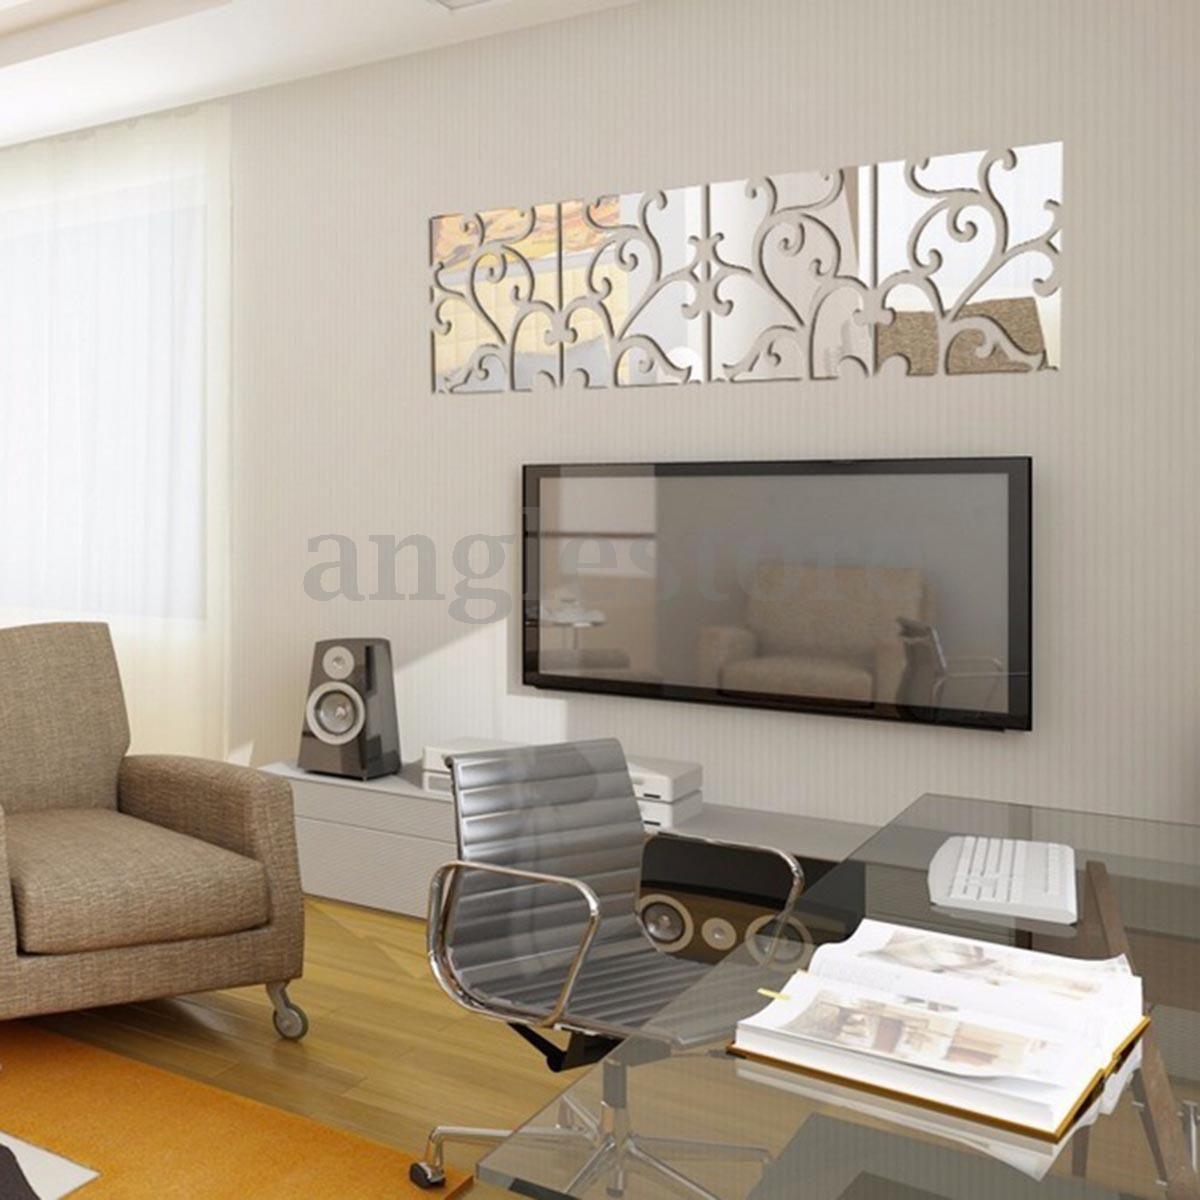 Pcs d vine mirror wall stickers art acrylic tile decal home decor